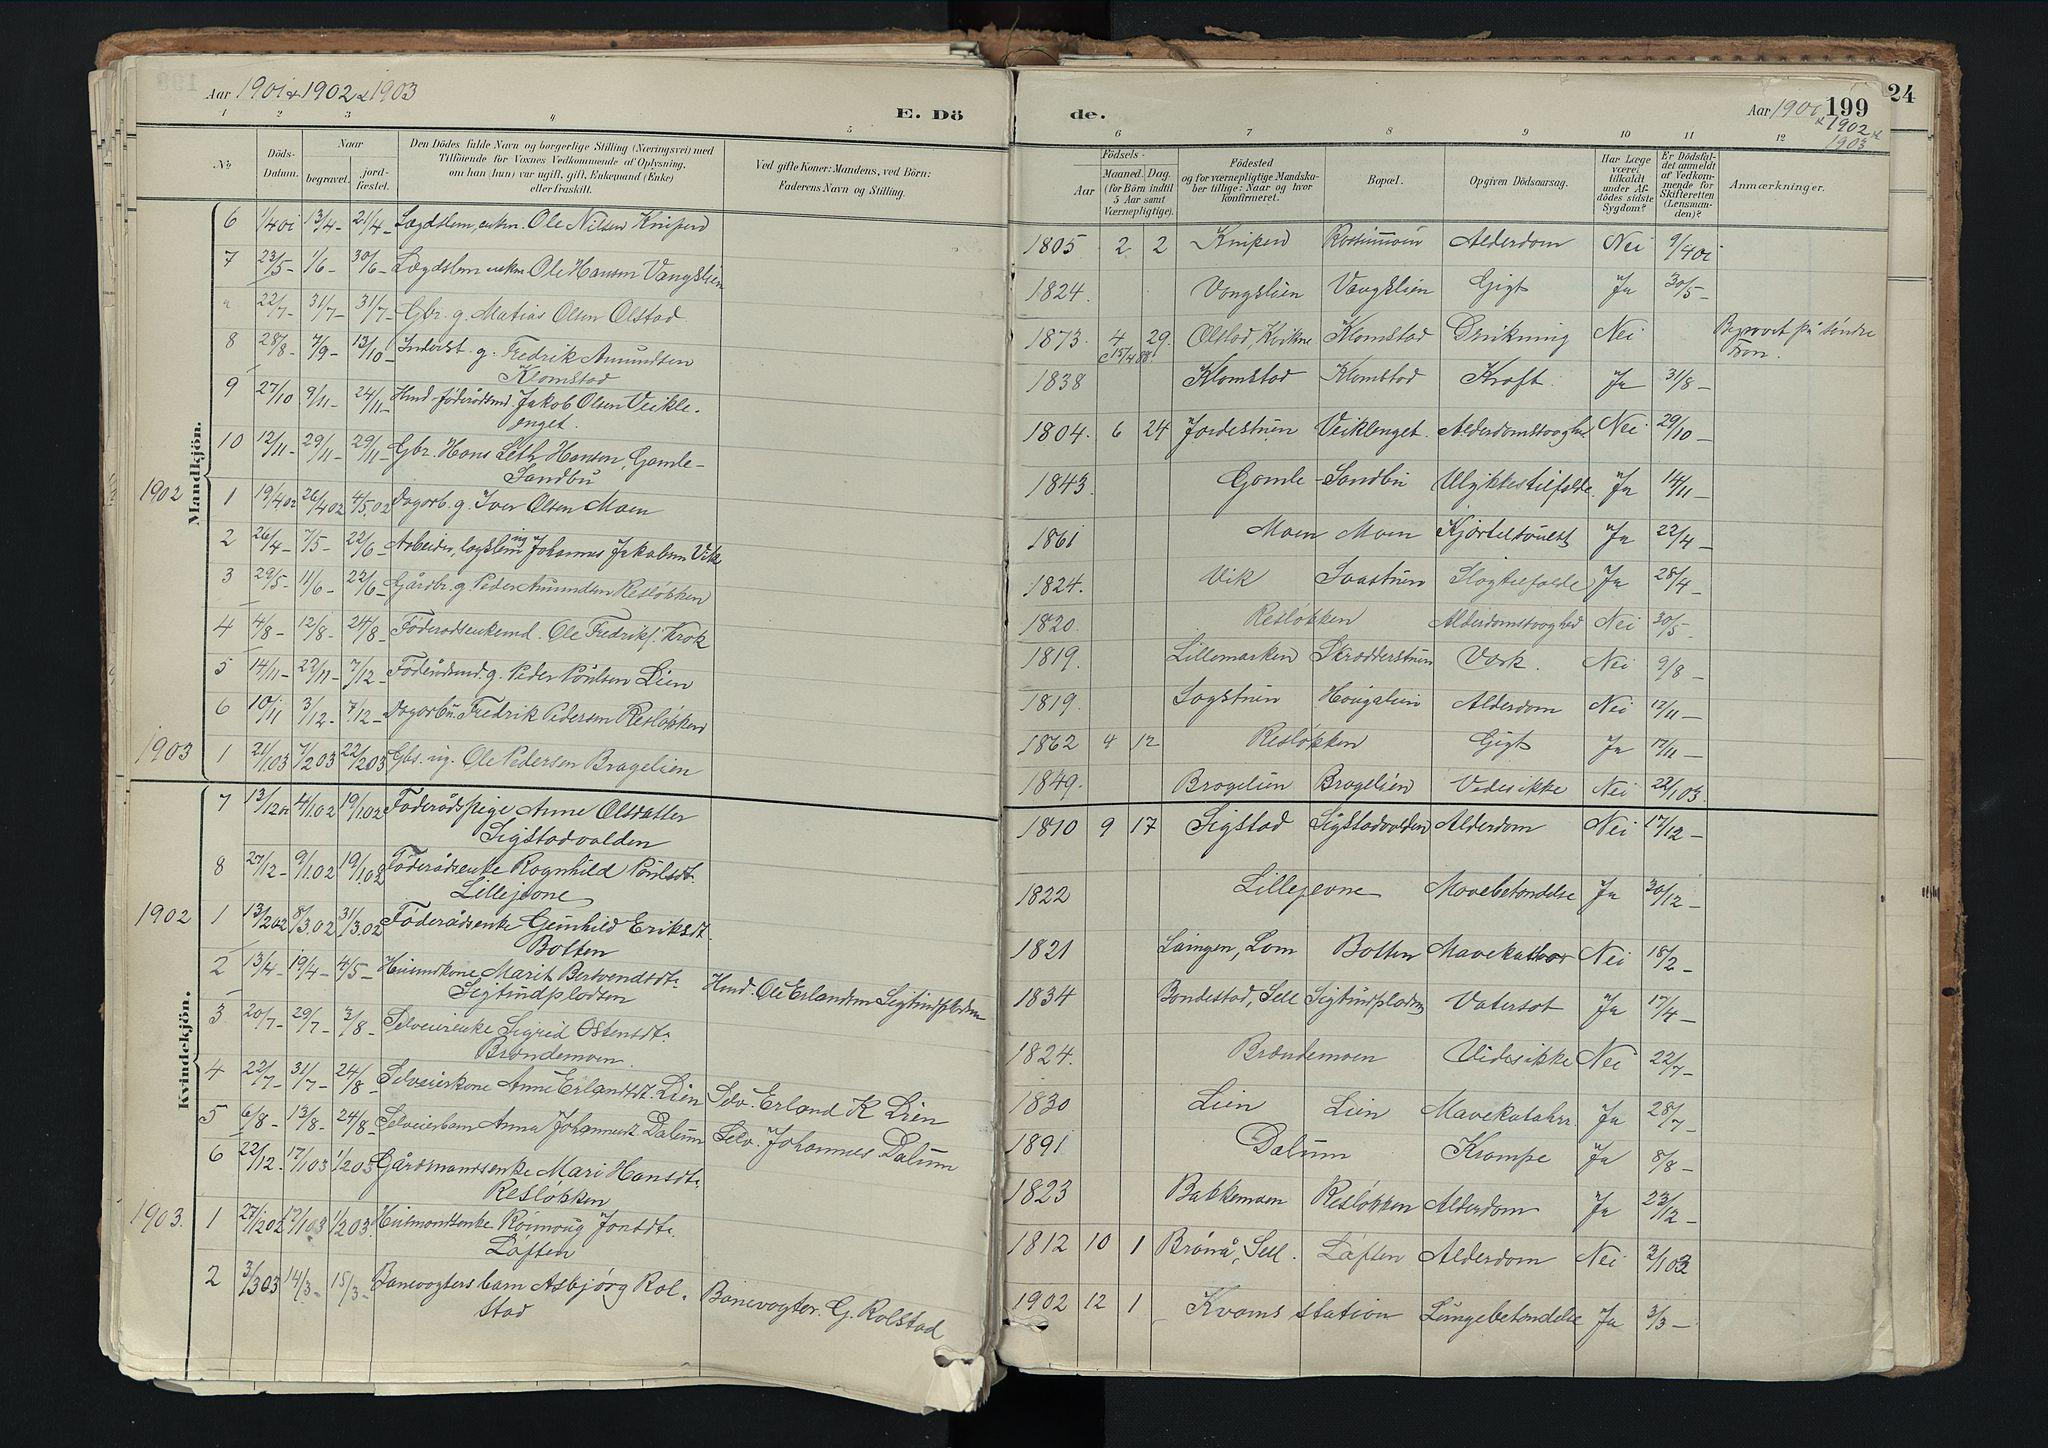 SAH, Nord-Fron prestekontor, Ministerialbok nr. 3, 1884-1914, s. 199